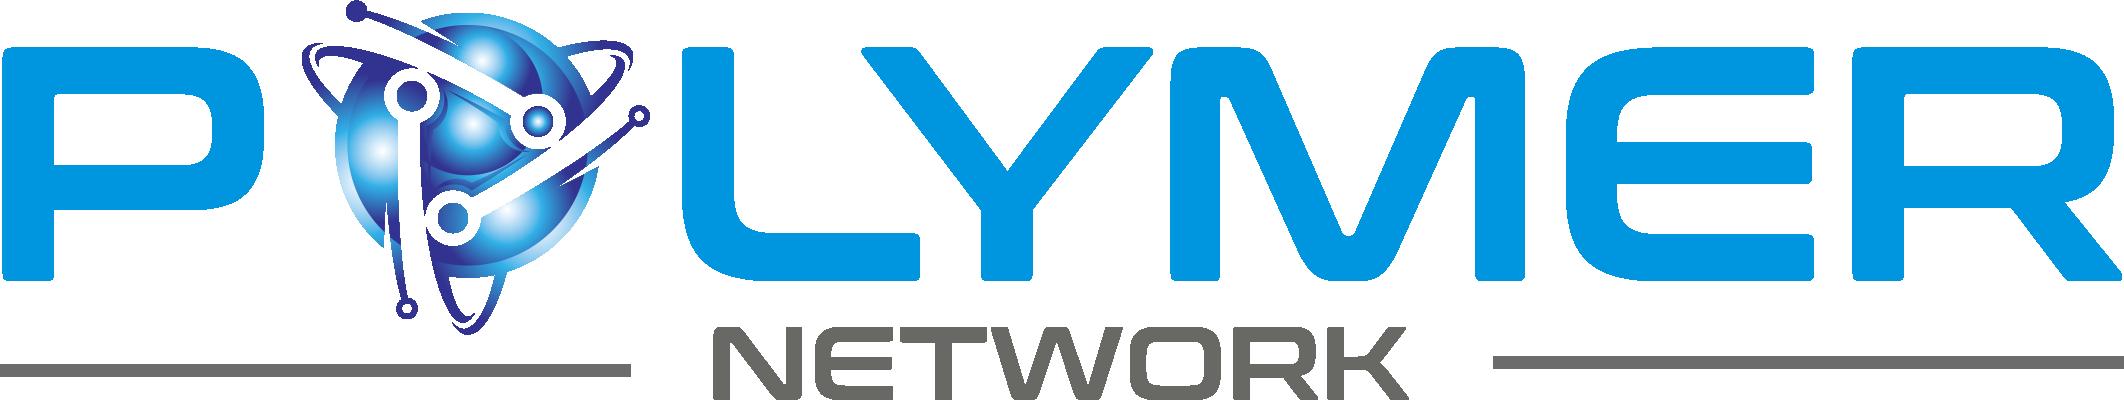 Polymer Network